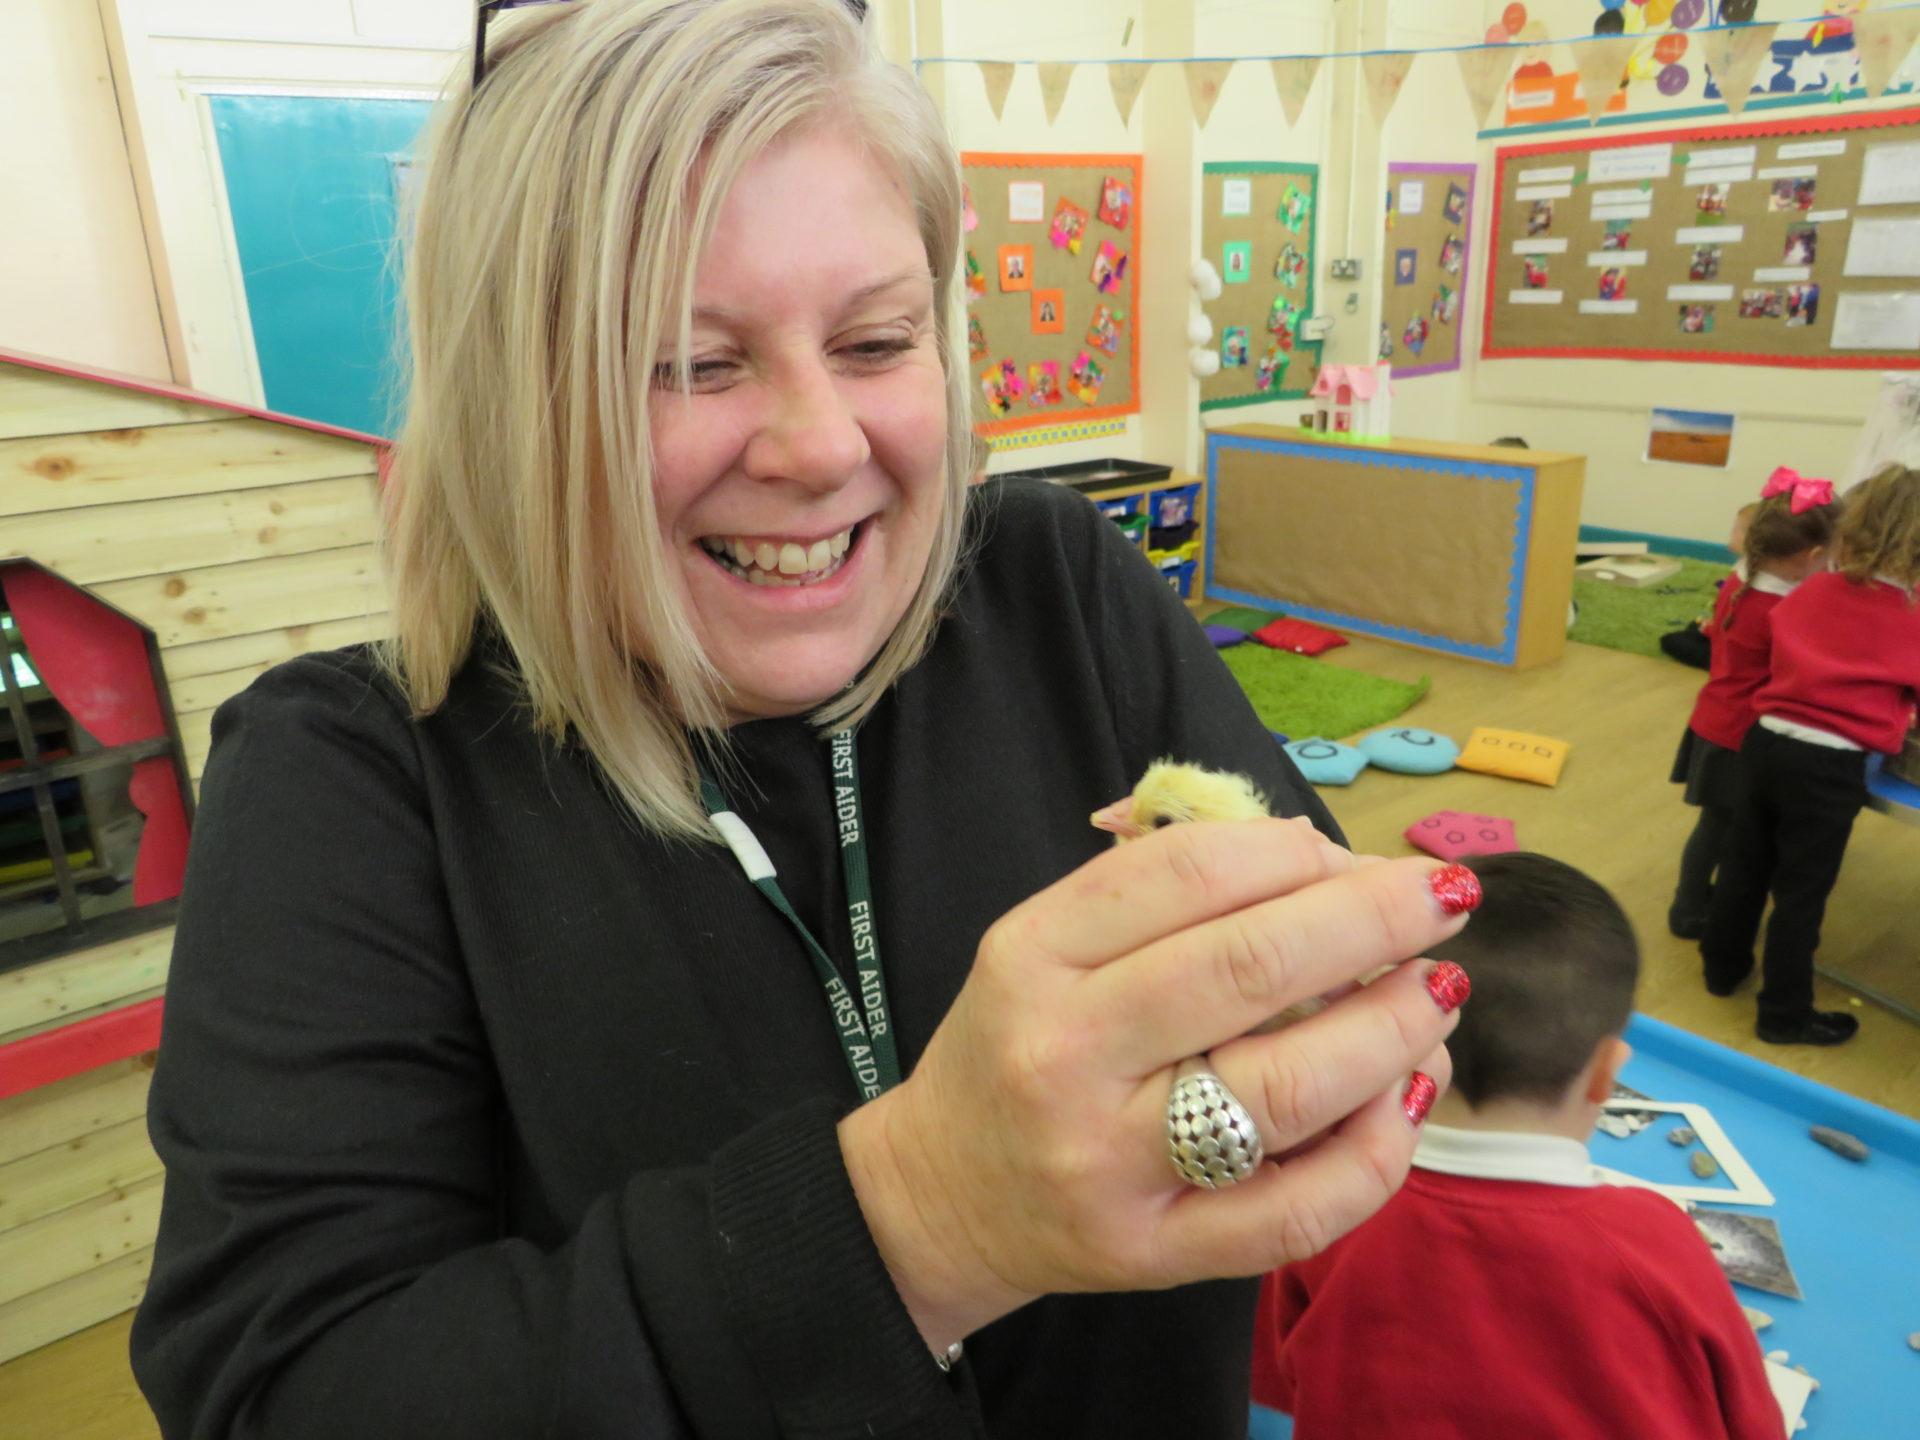 Sharon Hewitt is working with a Bristol primary school